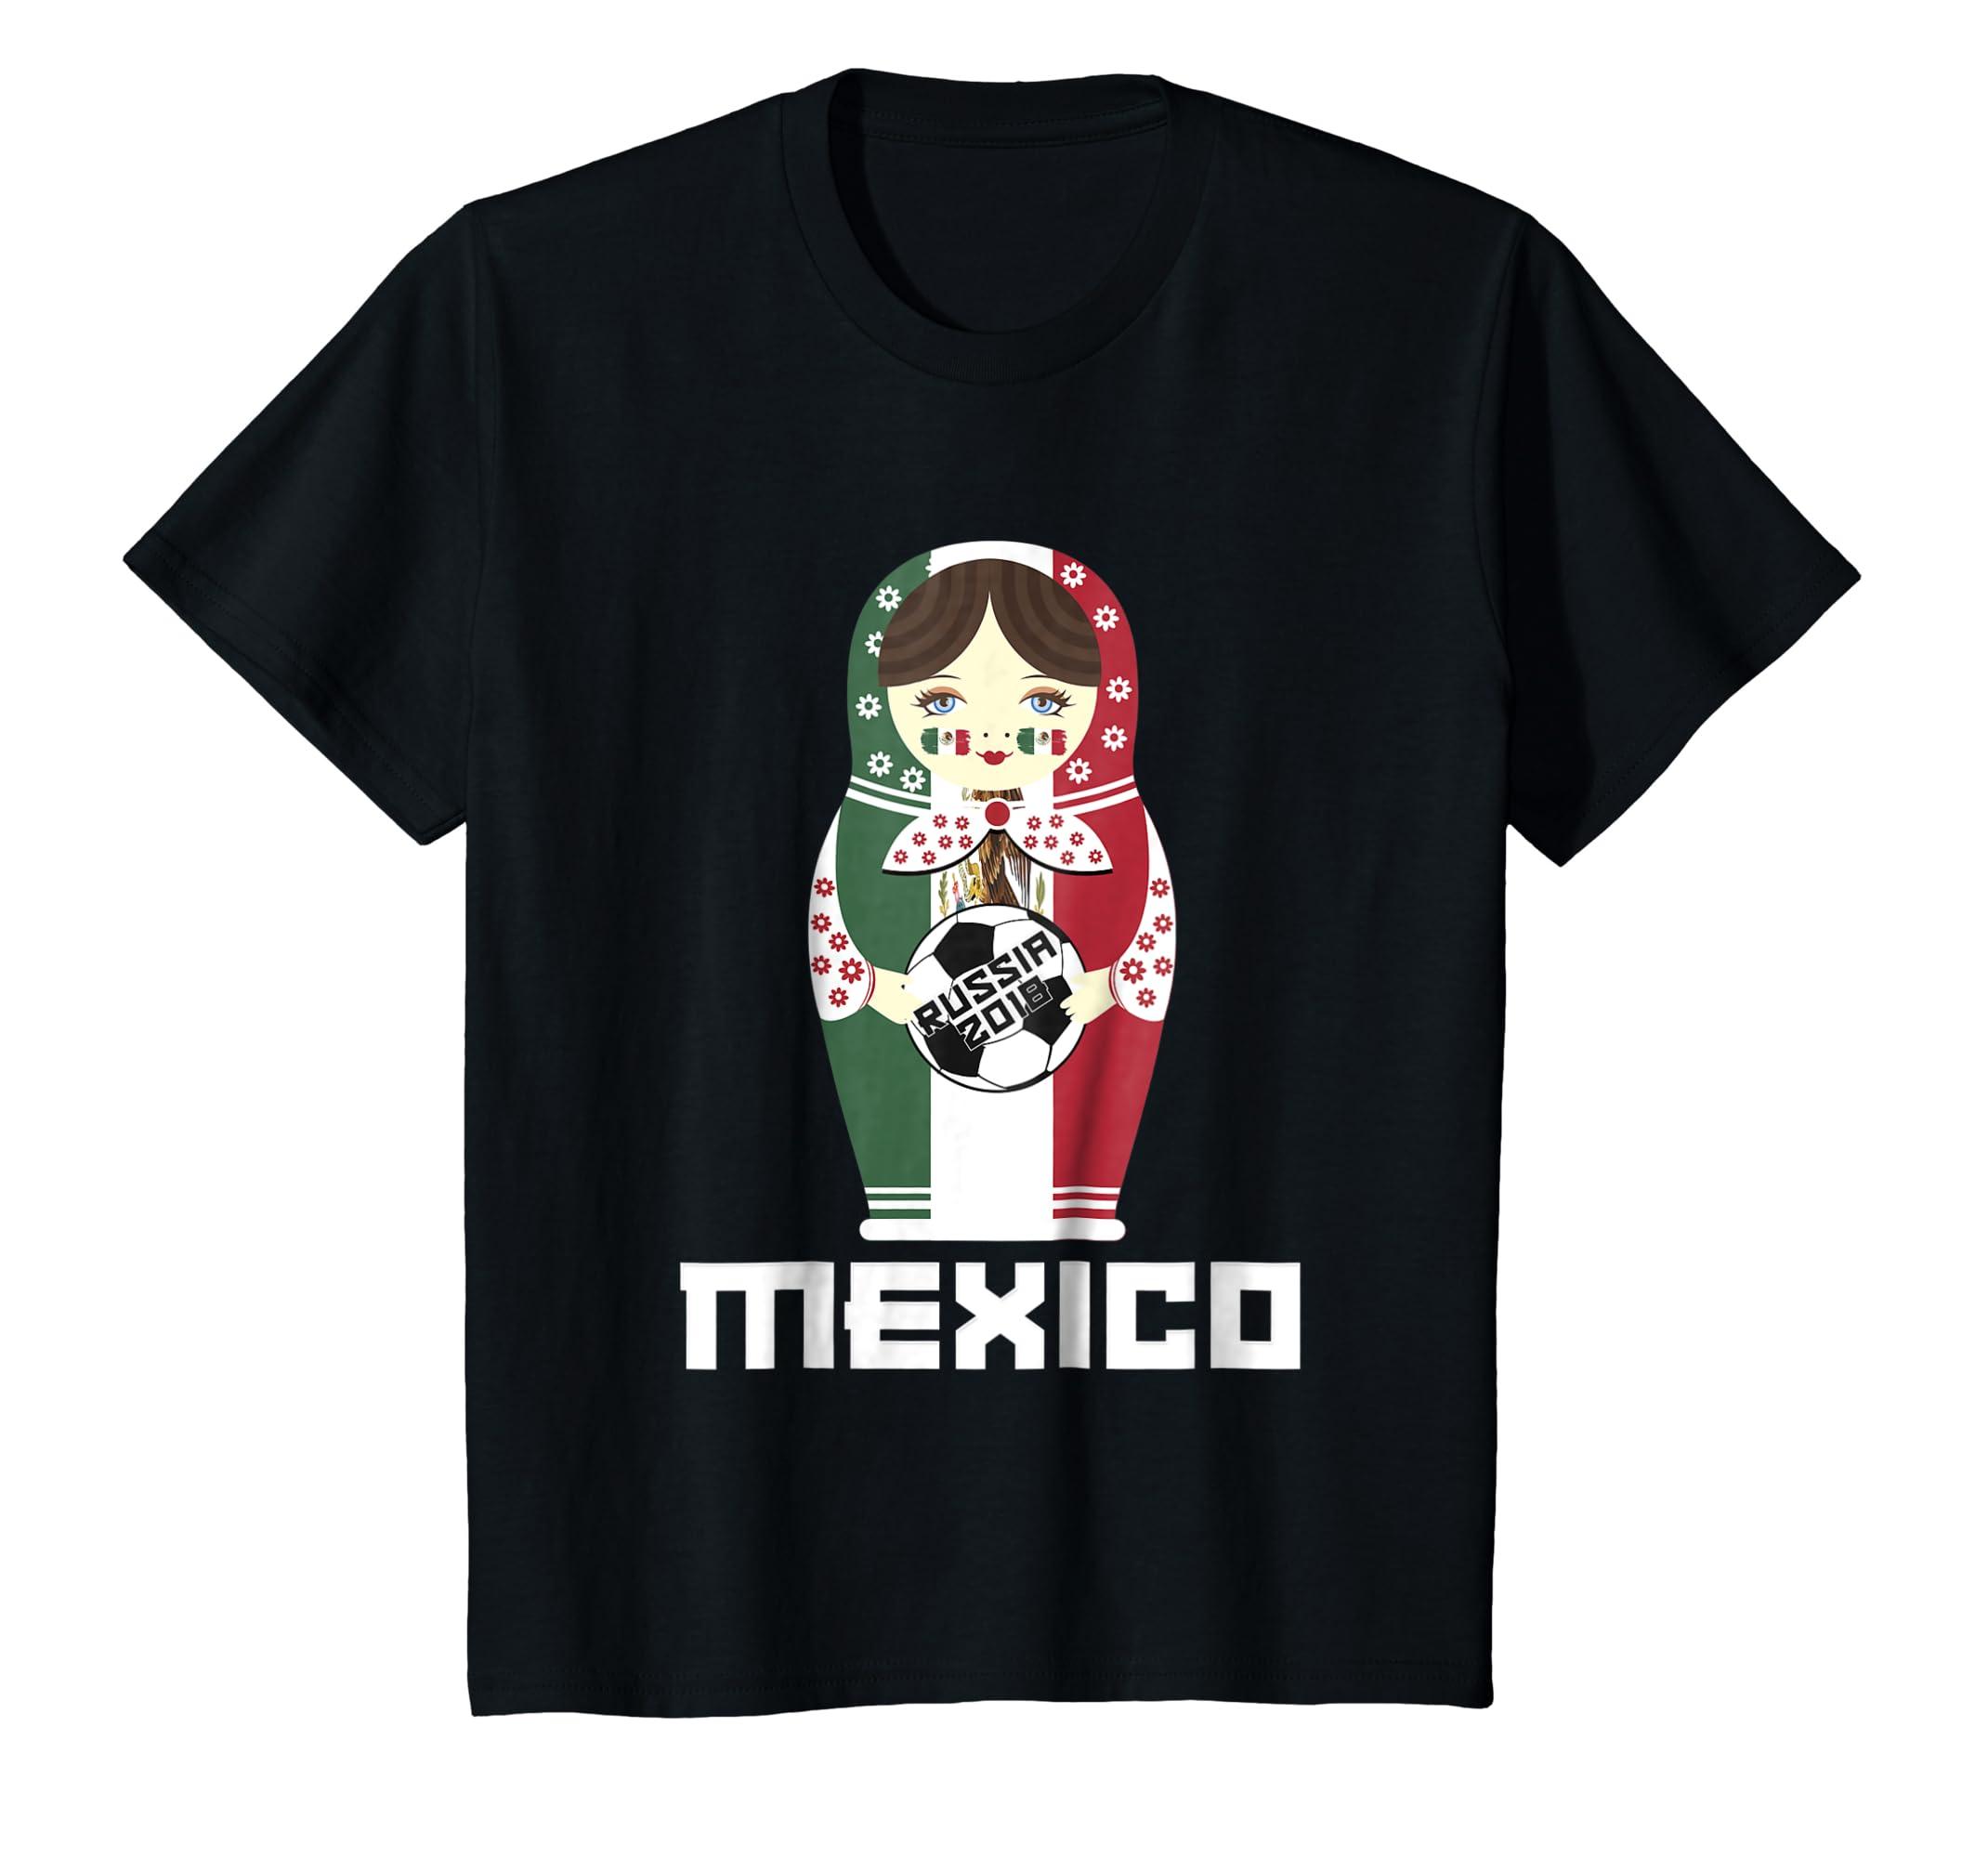 1b76f57392d Amazon.com: Mexico National Flag Dressed Matryoshka Soccer Fan Shirt:  Clothing